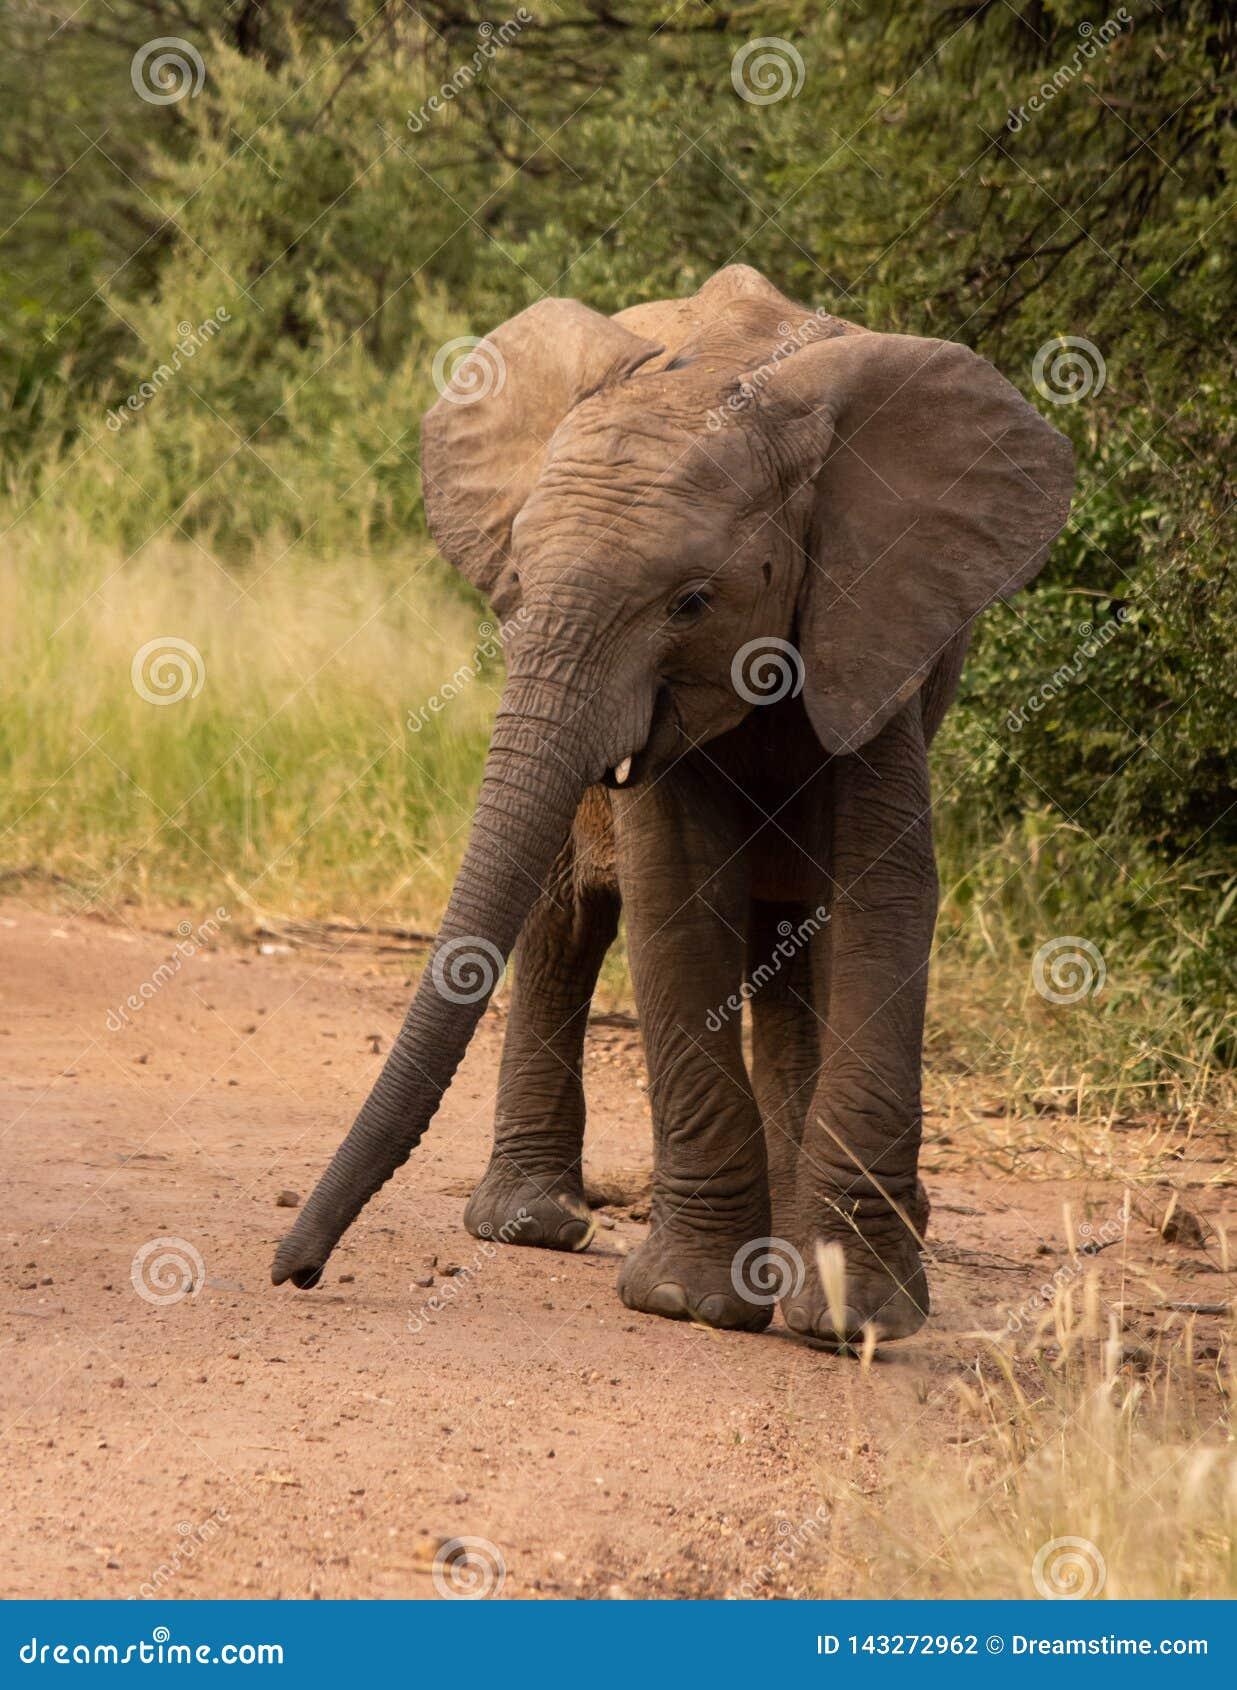 Elephant baby walking down a dirt road